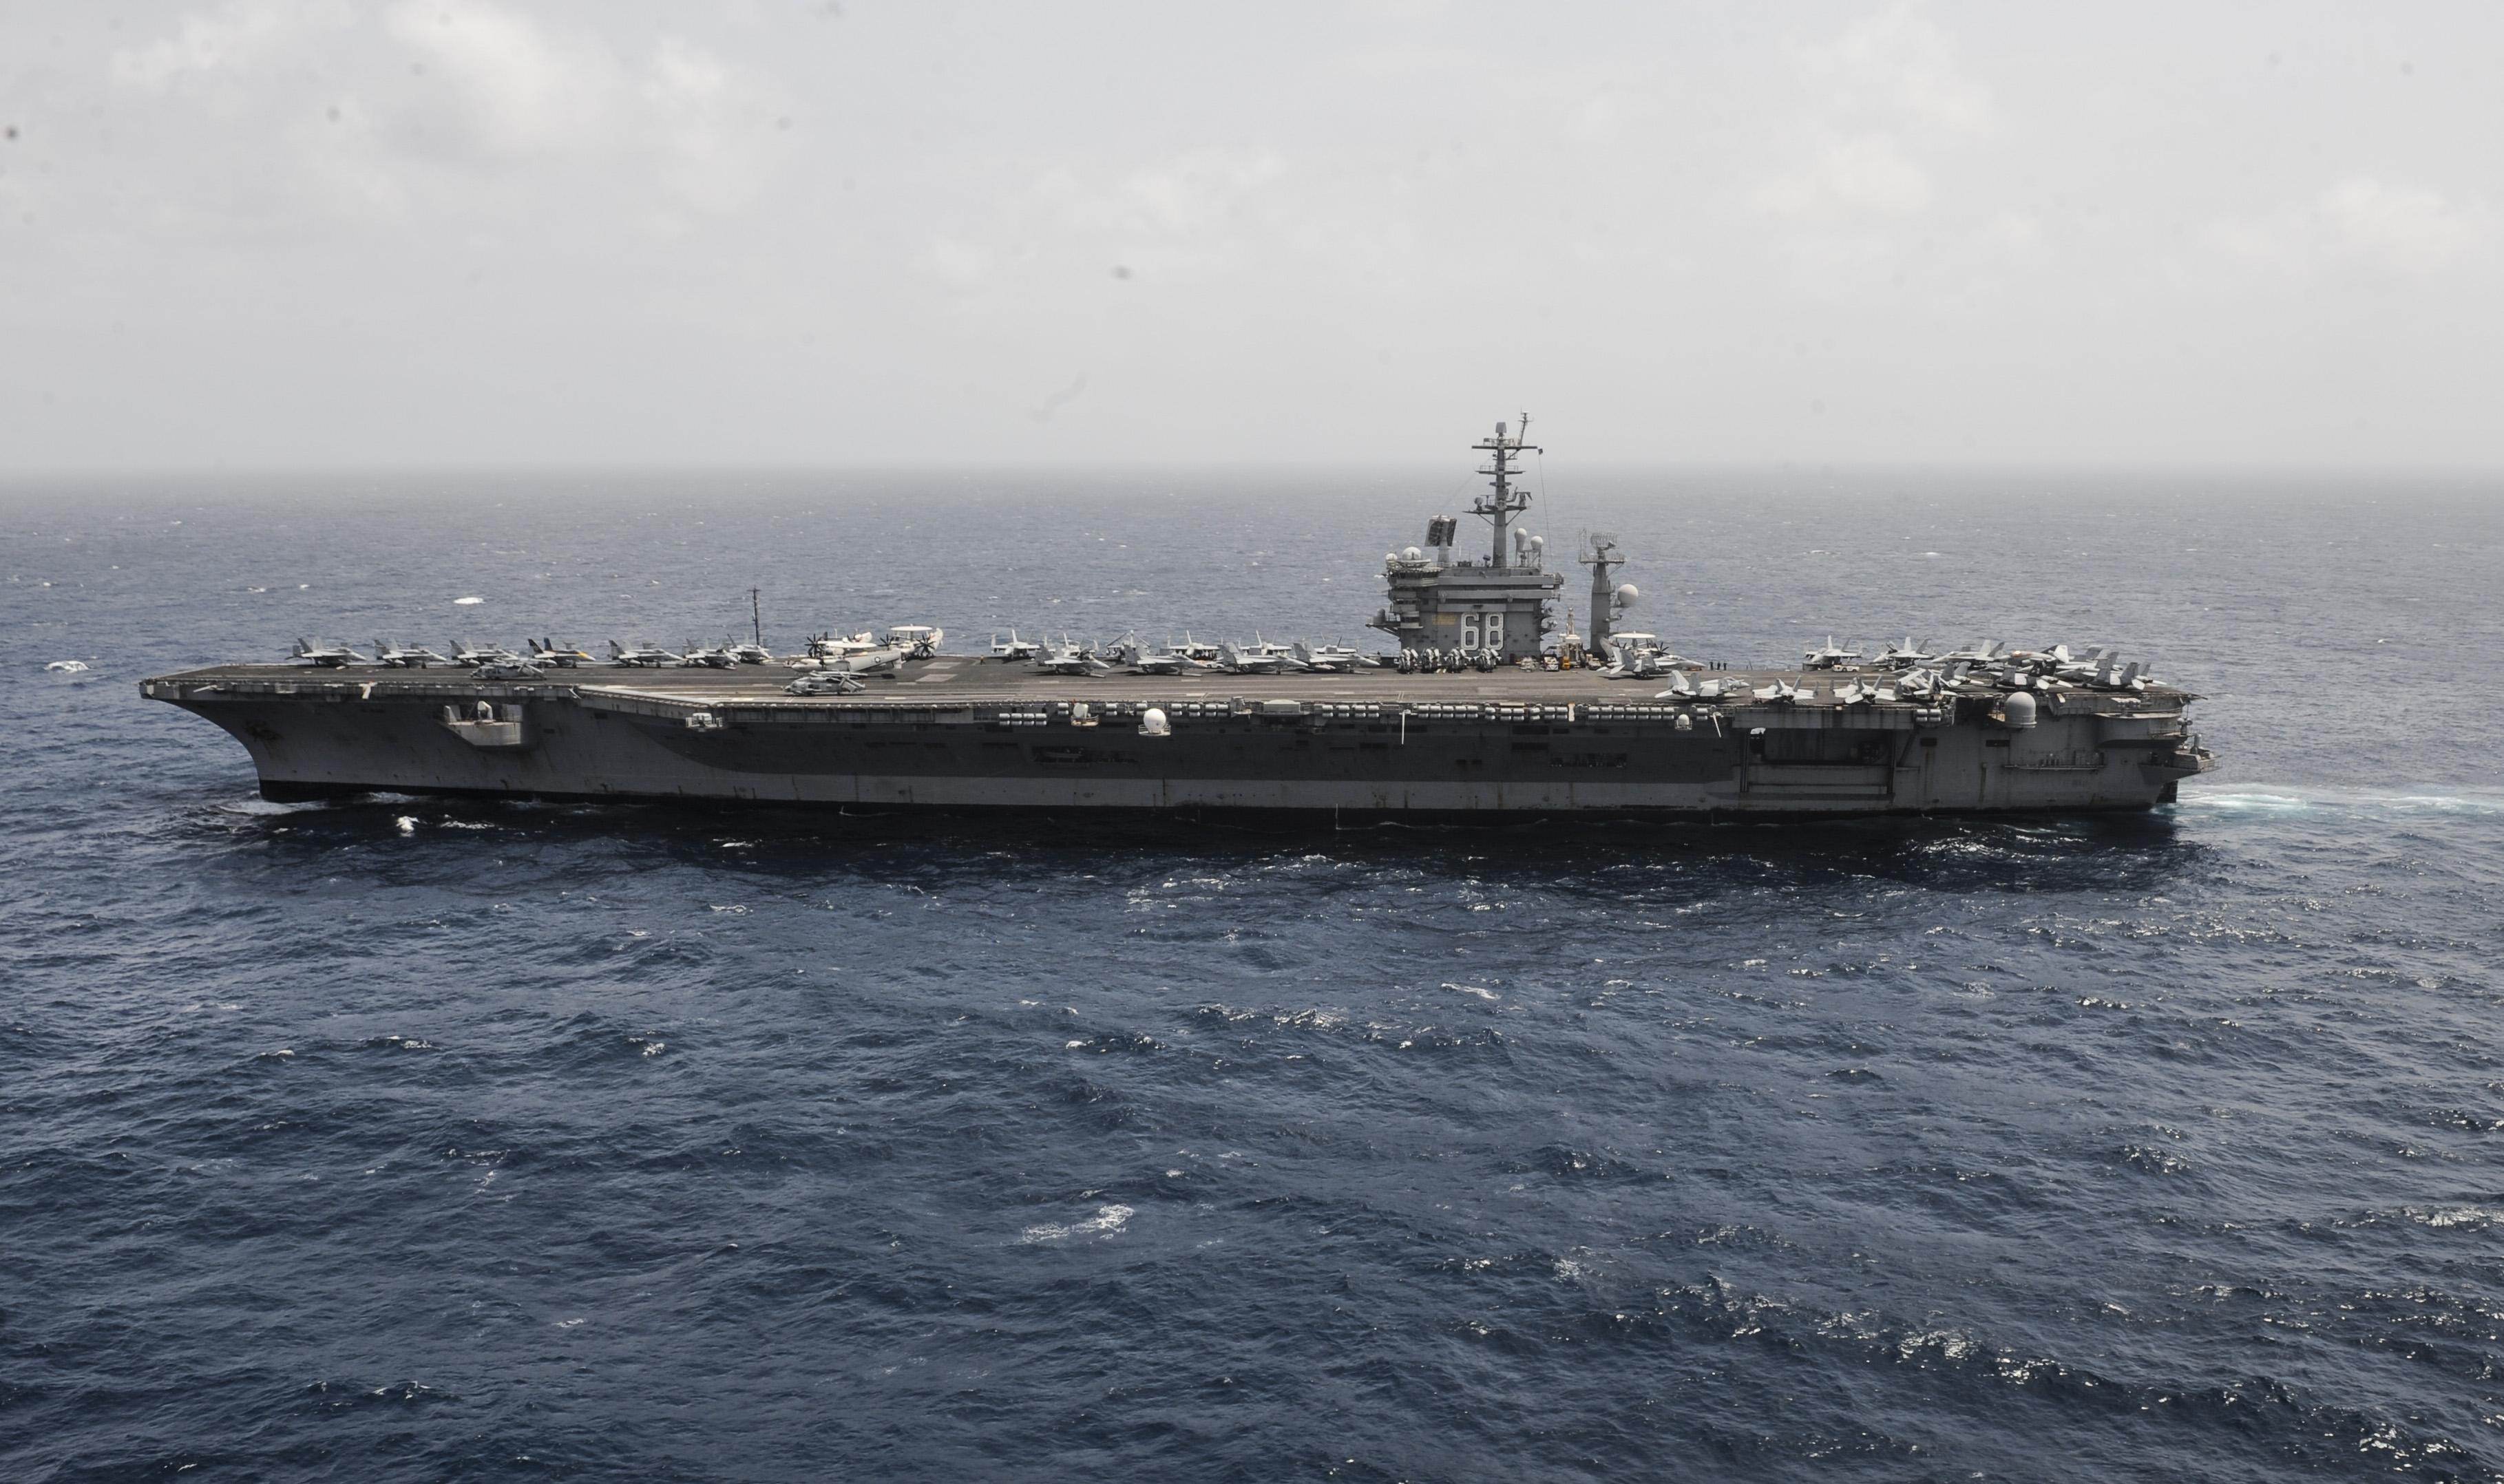 File:USS NIMITZ (CVN 68) 130829-N-RX668-1011 (9641163385).jpg - Wikimedia Commons